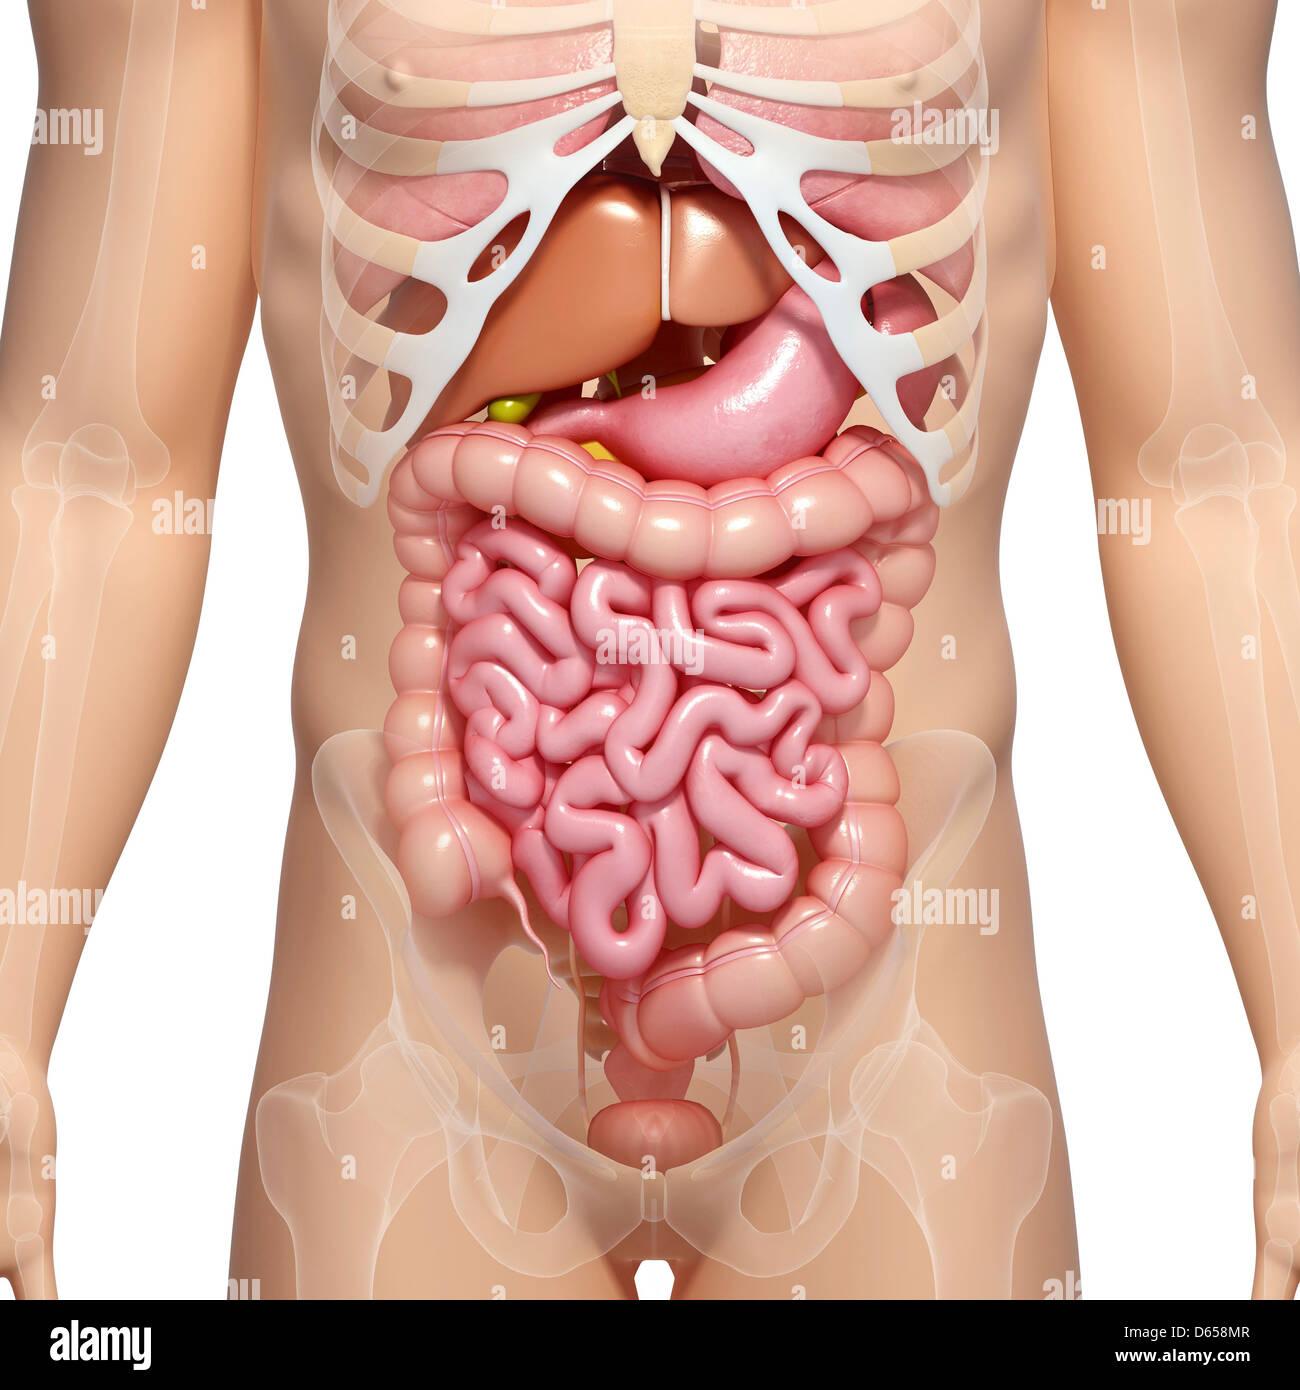 Male digestive system, artwork Stock Photo: 55435655 - Alamy